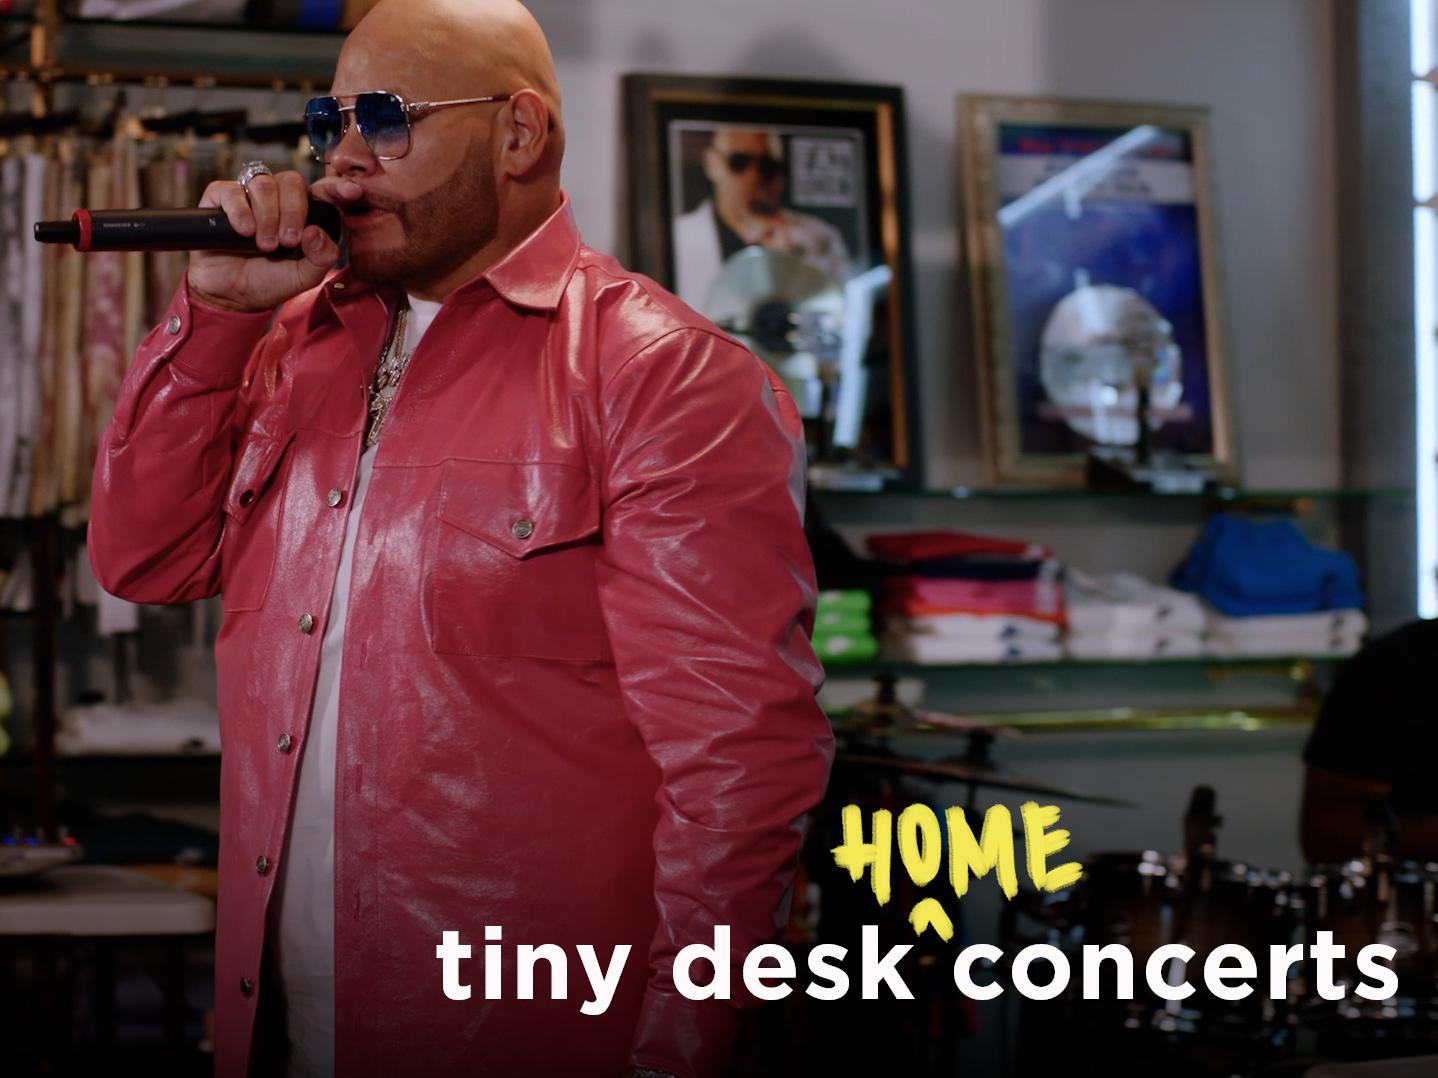 Fat Joe Performs Medley of Hits for NPR 'TIny Desk (Home) Concert'